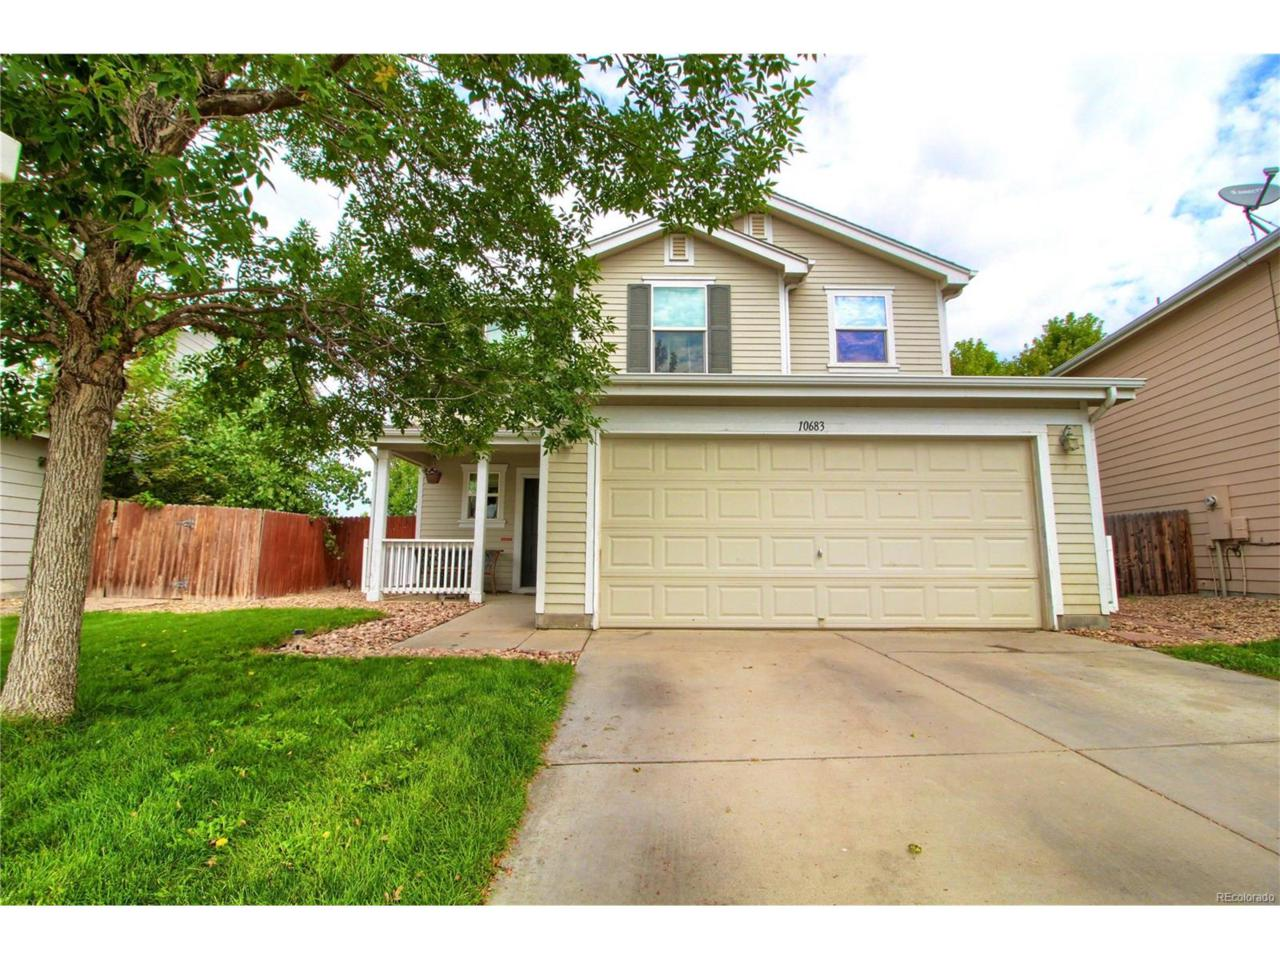 10683 Butte Drive, Longmont, CO 80504 (MLS #5941270) :: 8z Real Estate